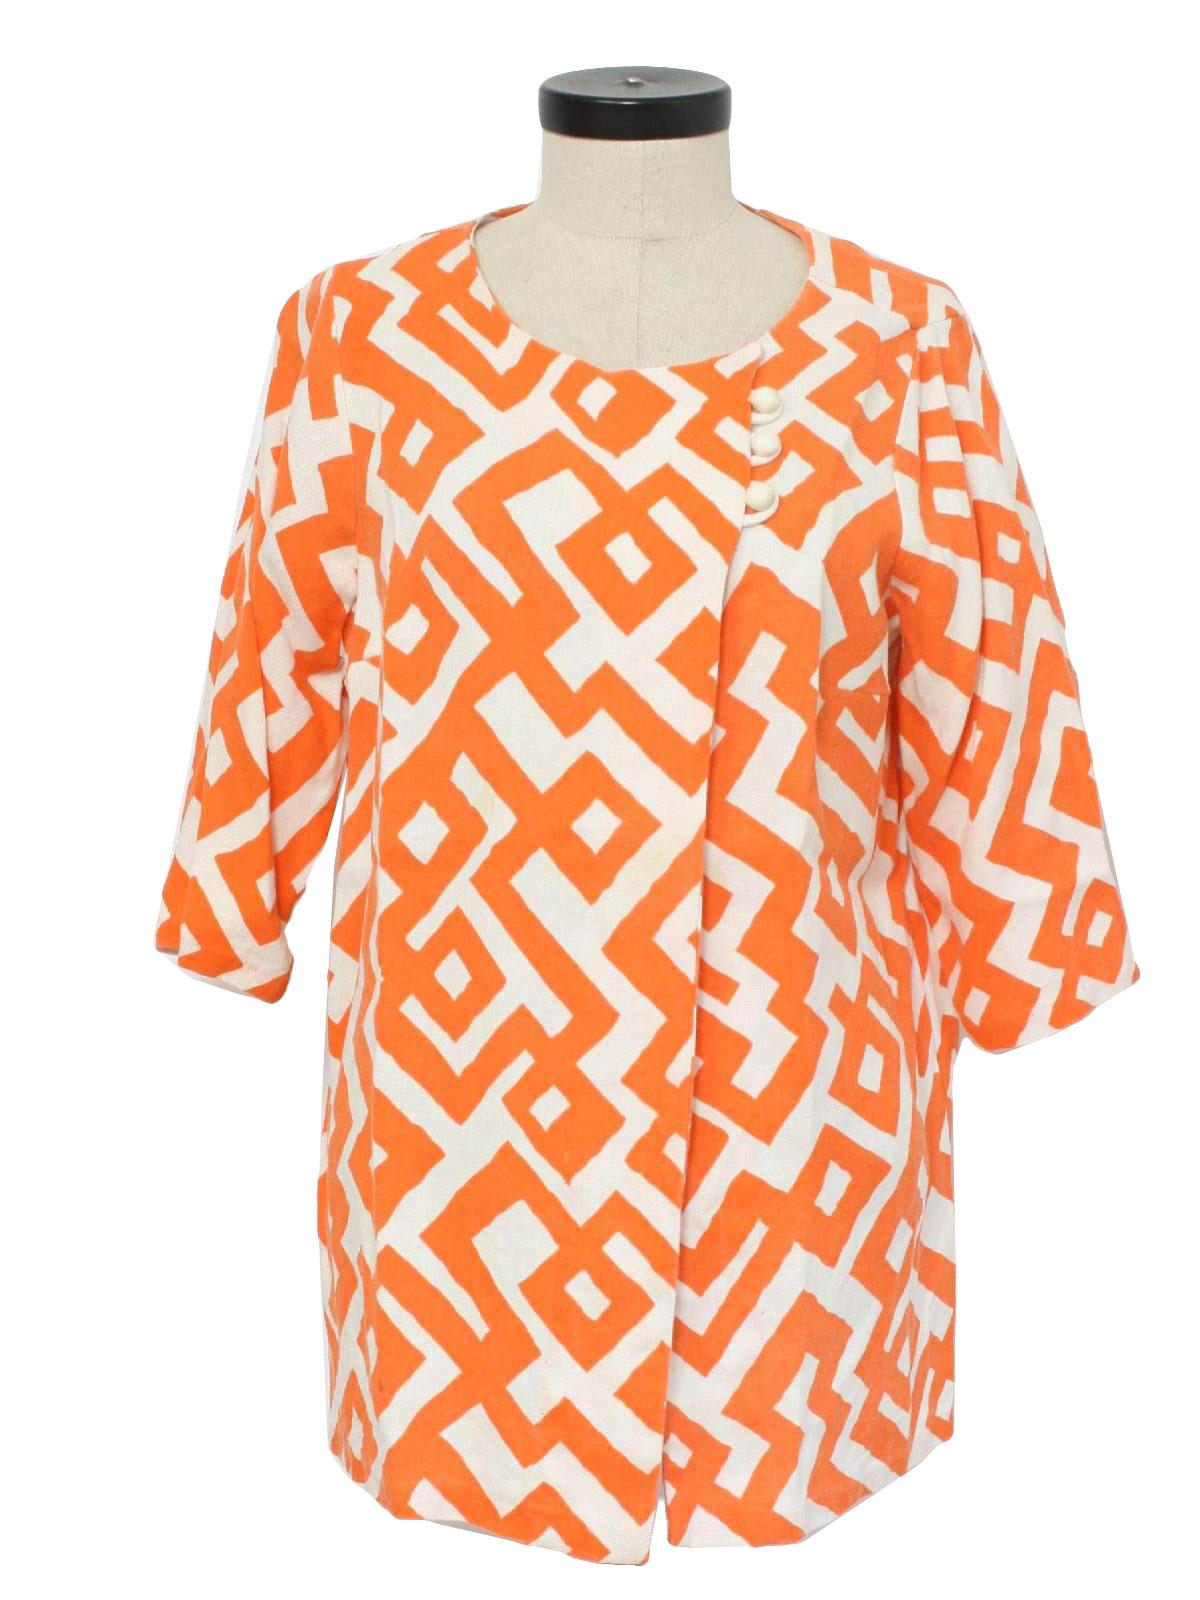 c0b0ef66606 1960's Womens Tunic Shirt